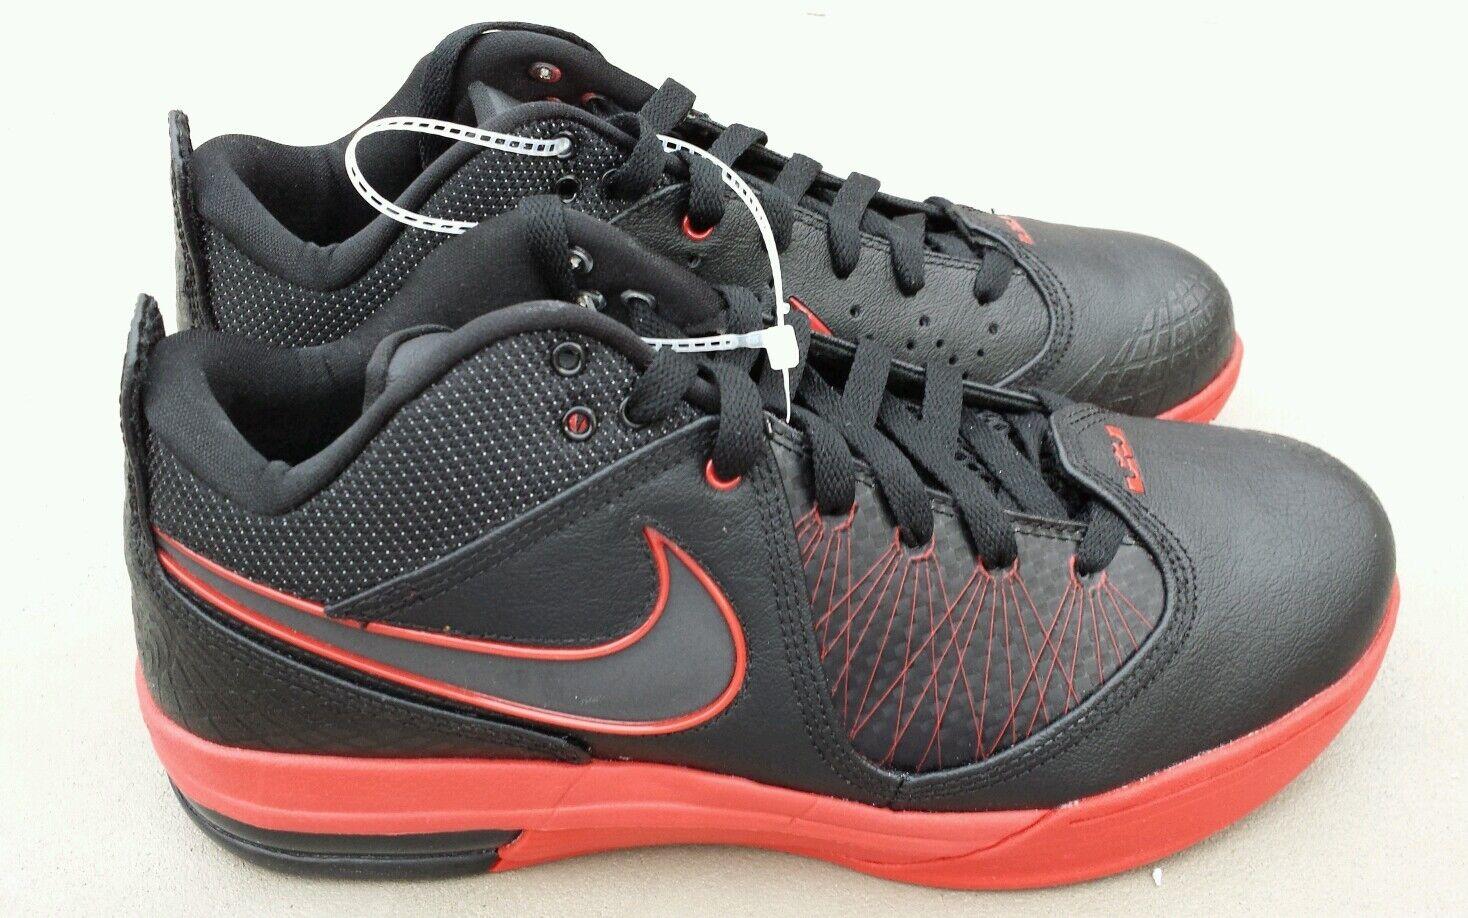 Nike Lebron James Air Max Ambassador IV 4 Mens size 9.5 Blk Red shoes 456815-004